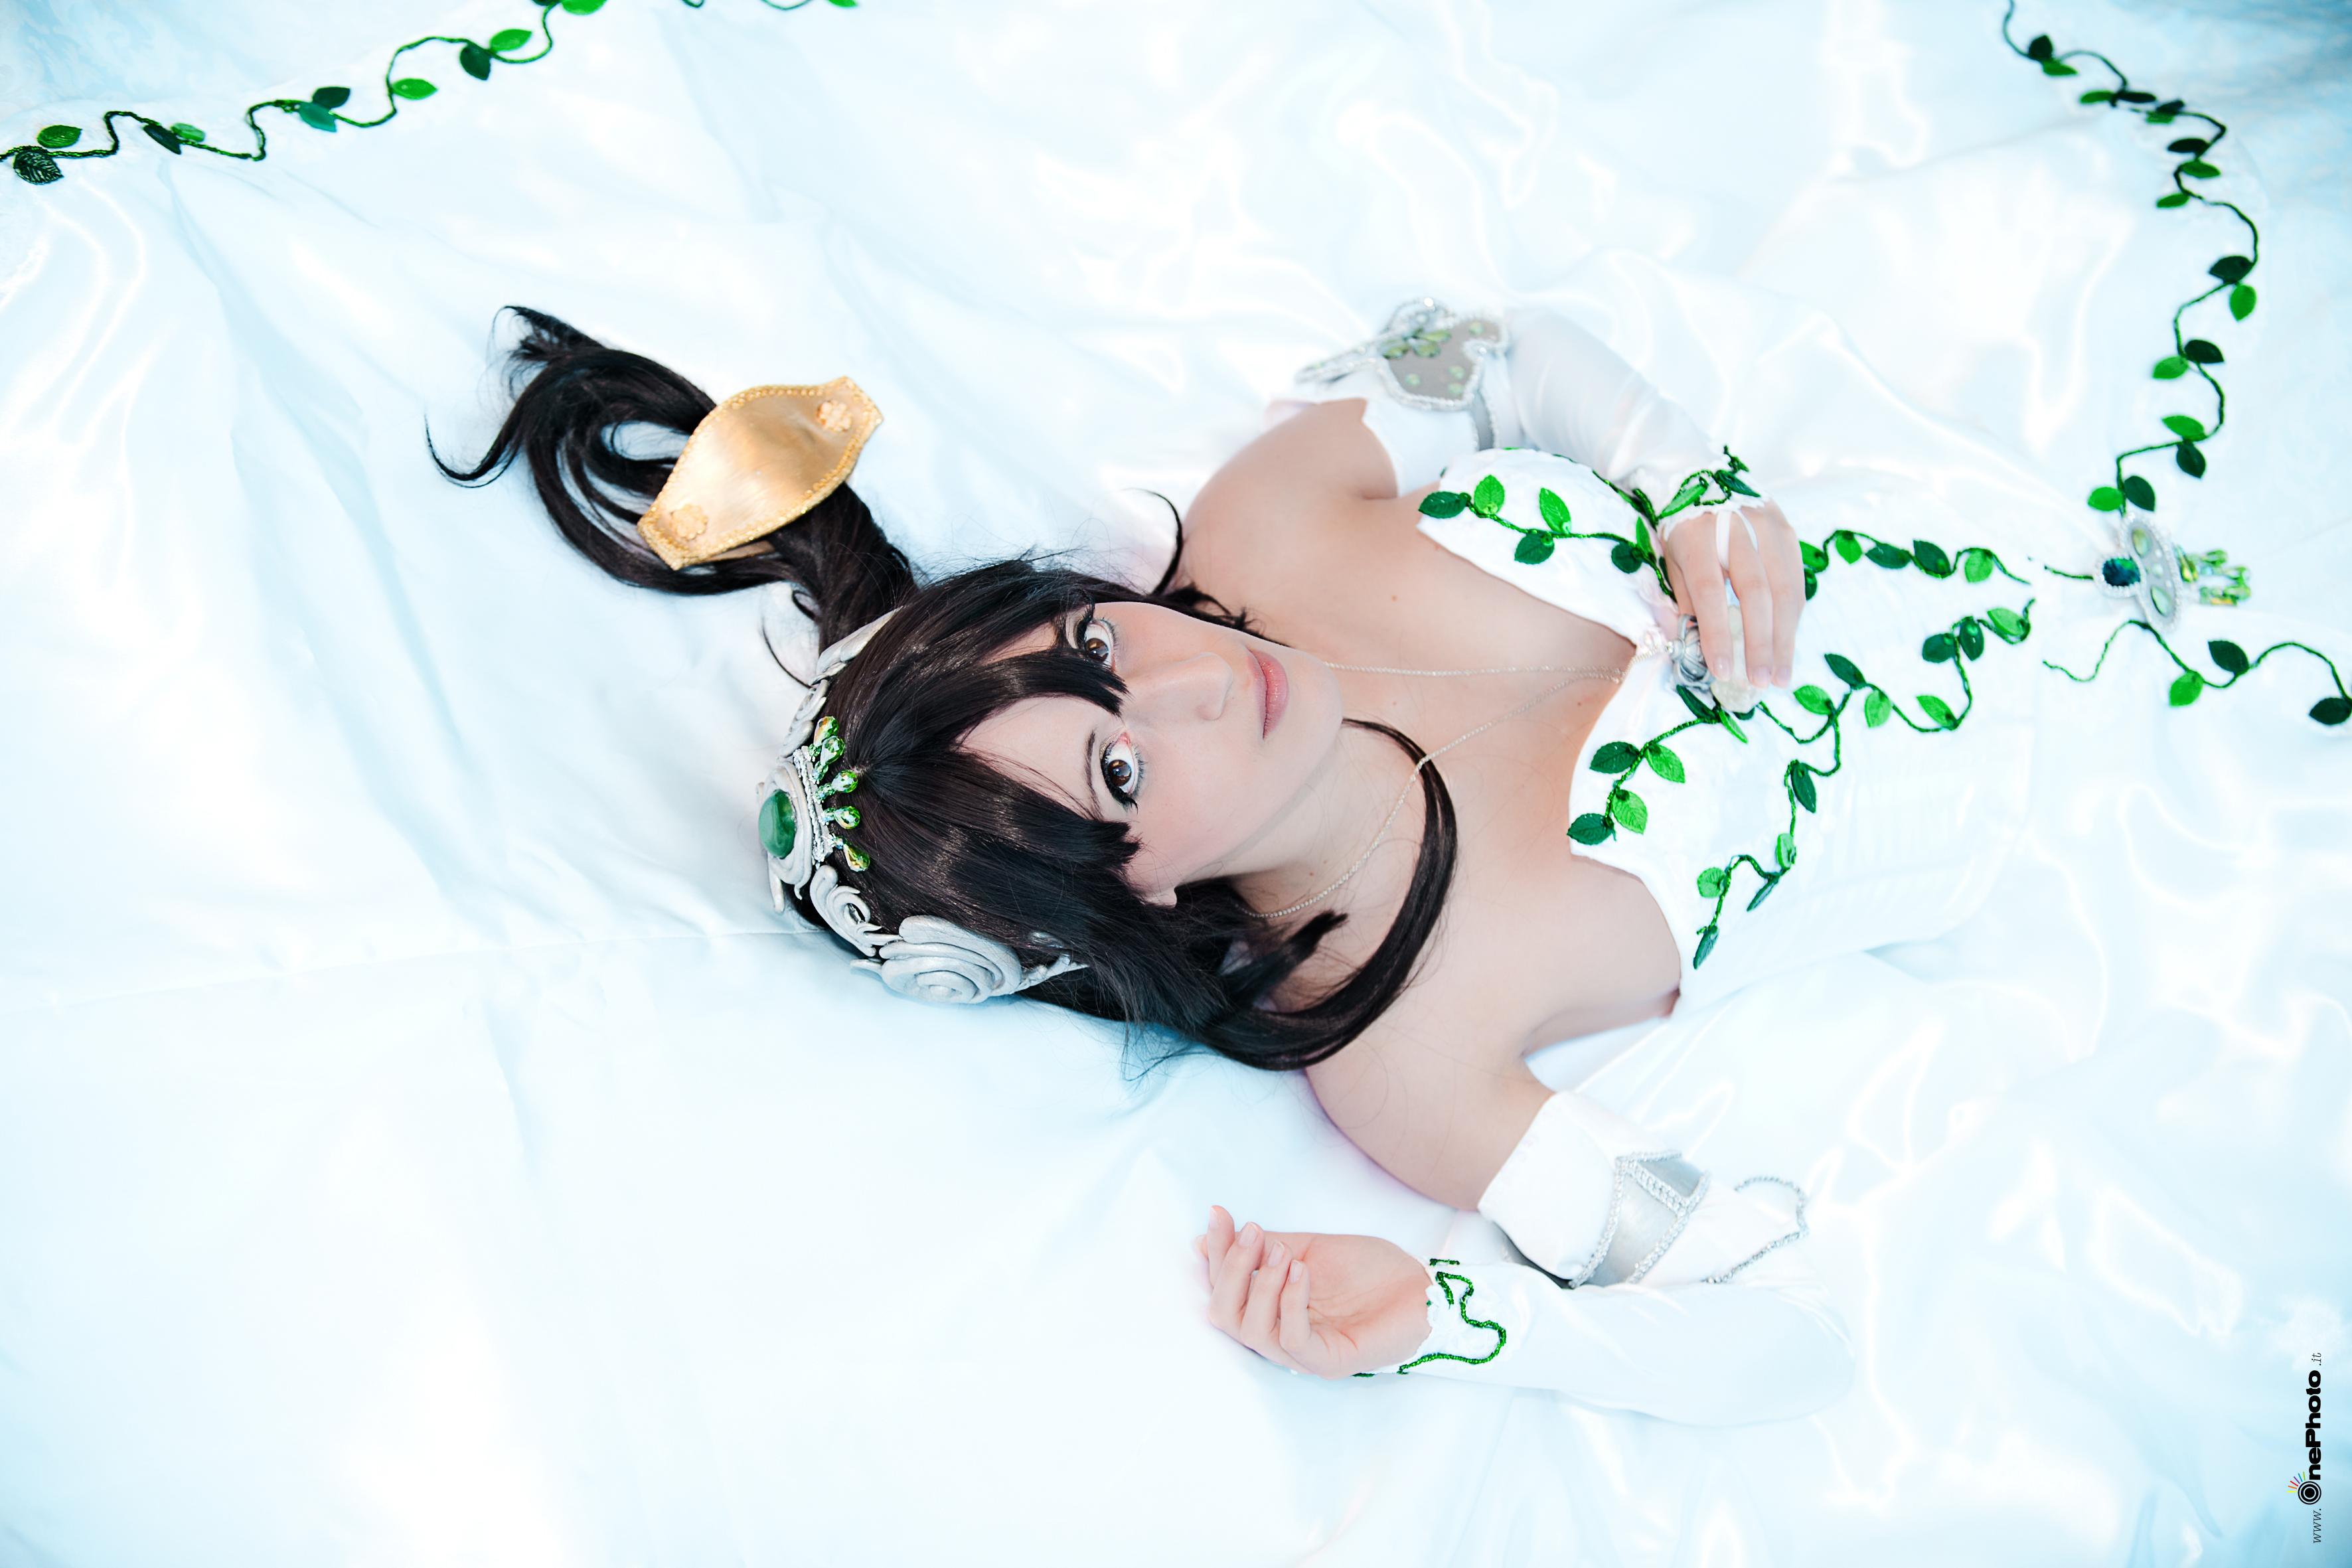 Garnet Cosplay - A White Fairytale by Selhin